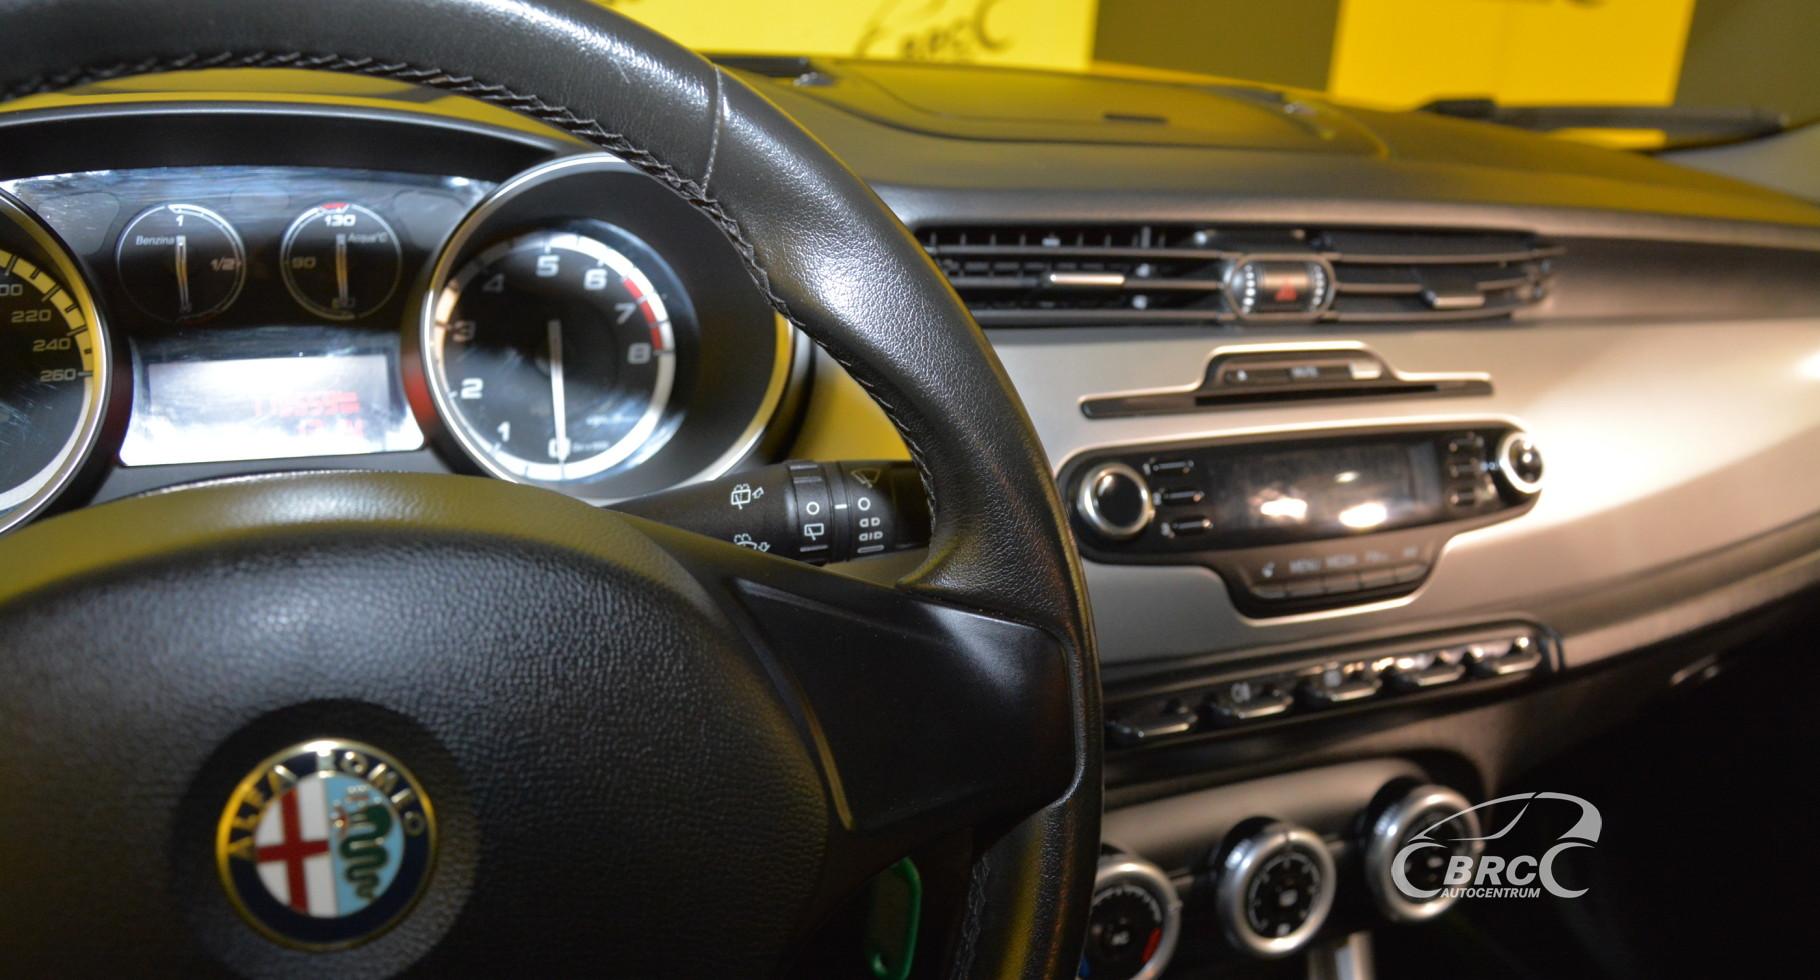 Alfa Romeo Giulietta 1.4i Turbo MT